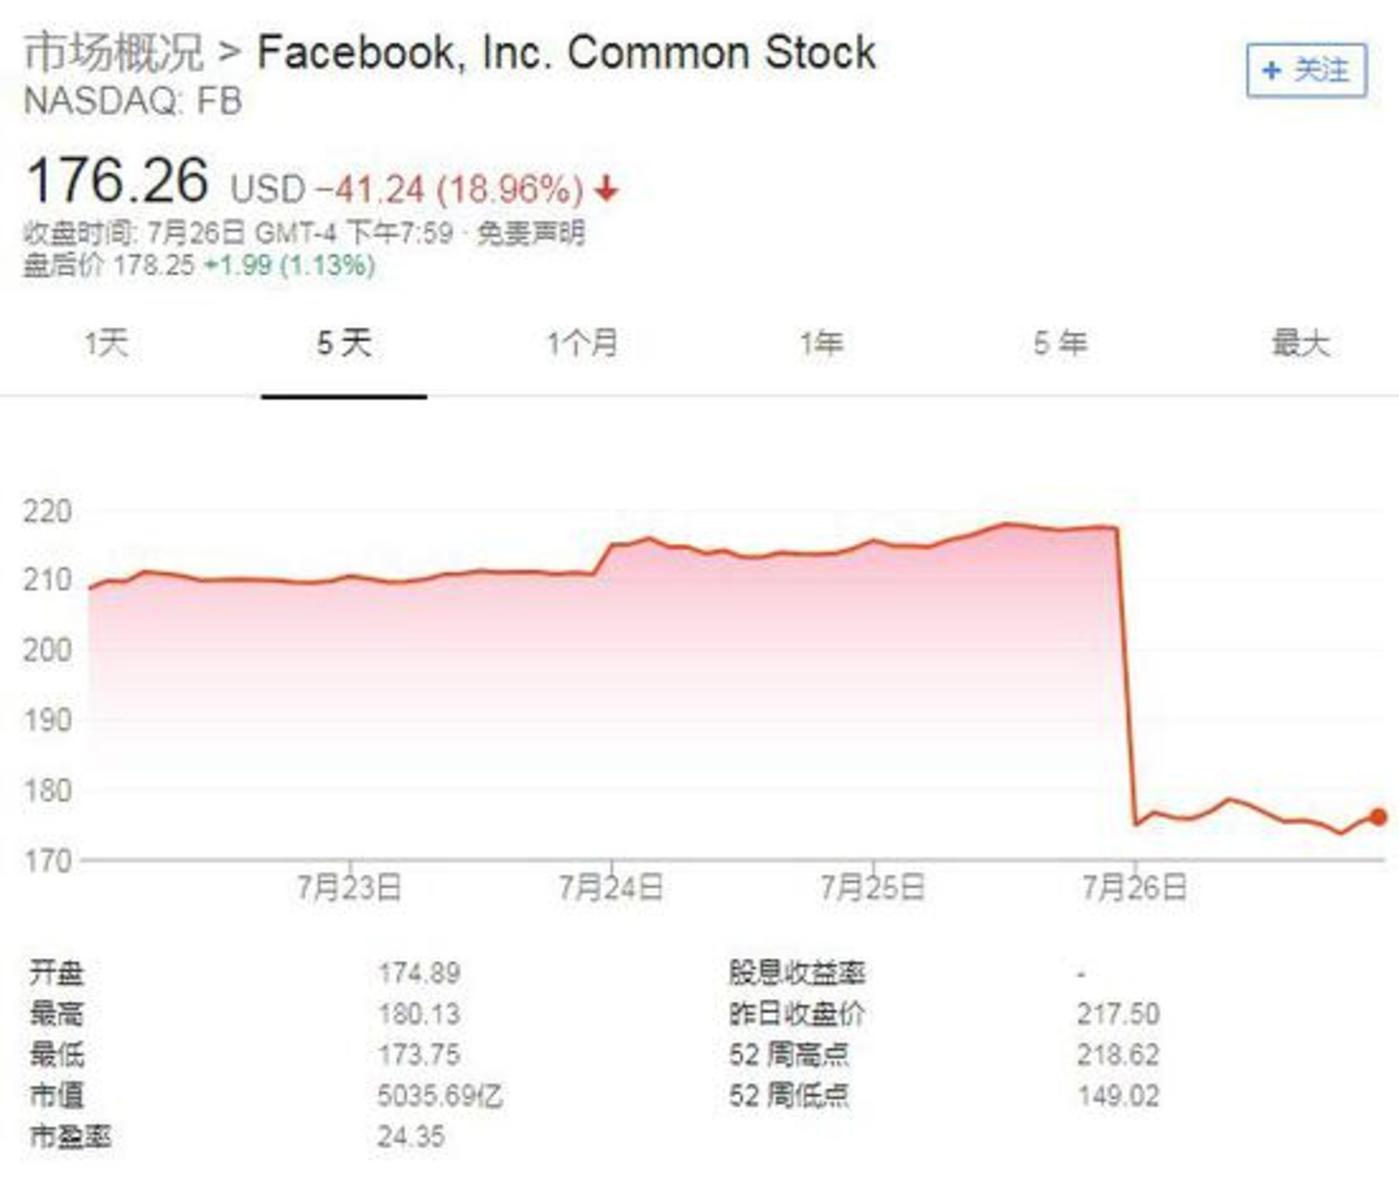 Facebook五日内股价图(截至北京时间7月27日10:10,来源:谷歌)